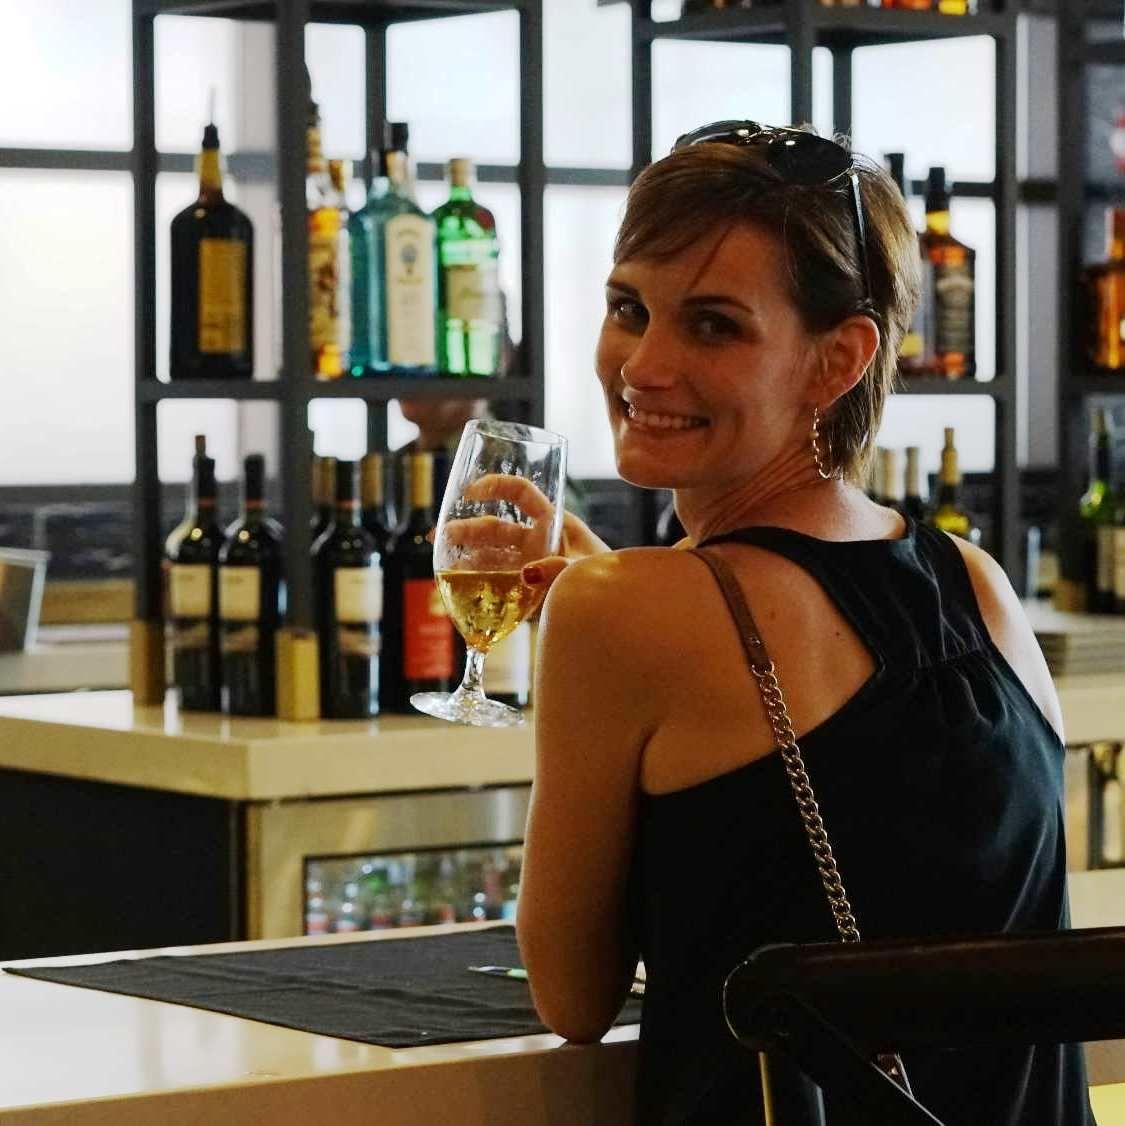 Universal Citywalk Trip Report June 2014 Vivo Italian Kitchen